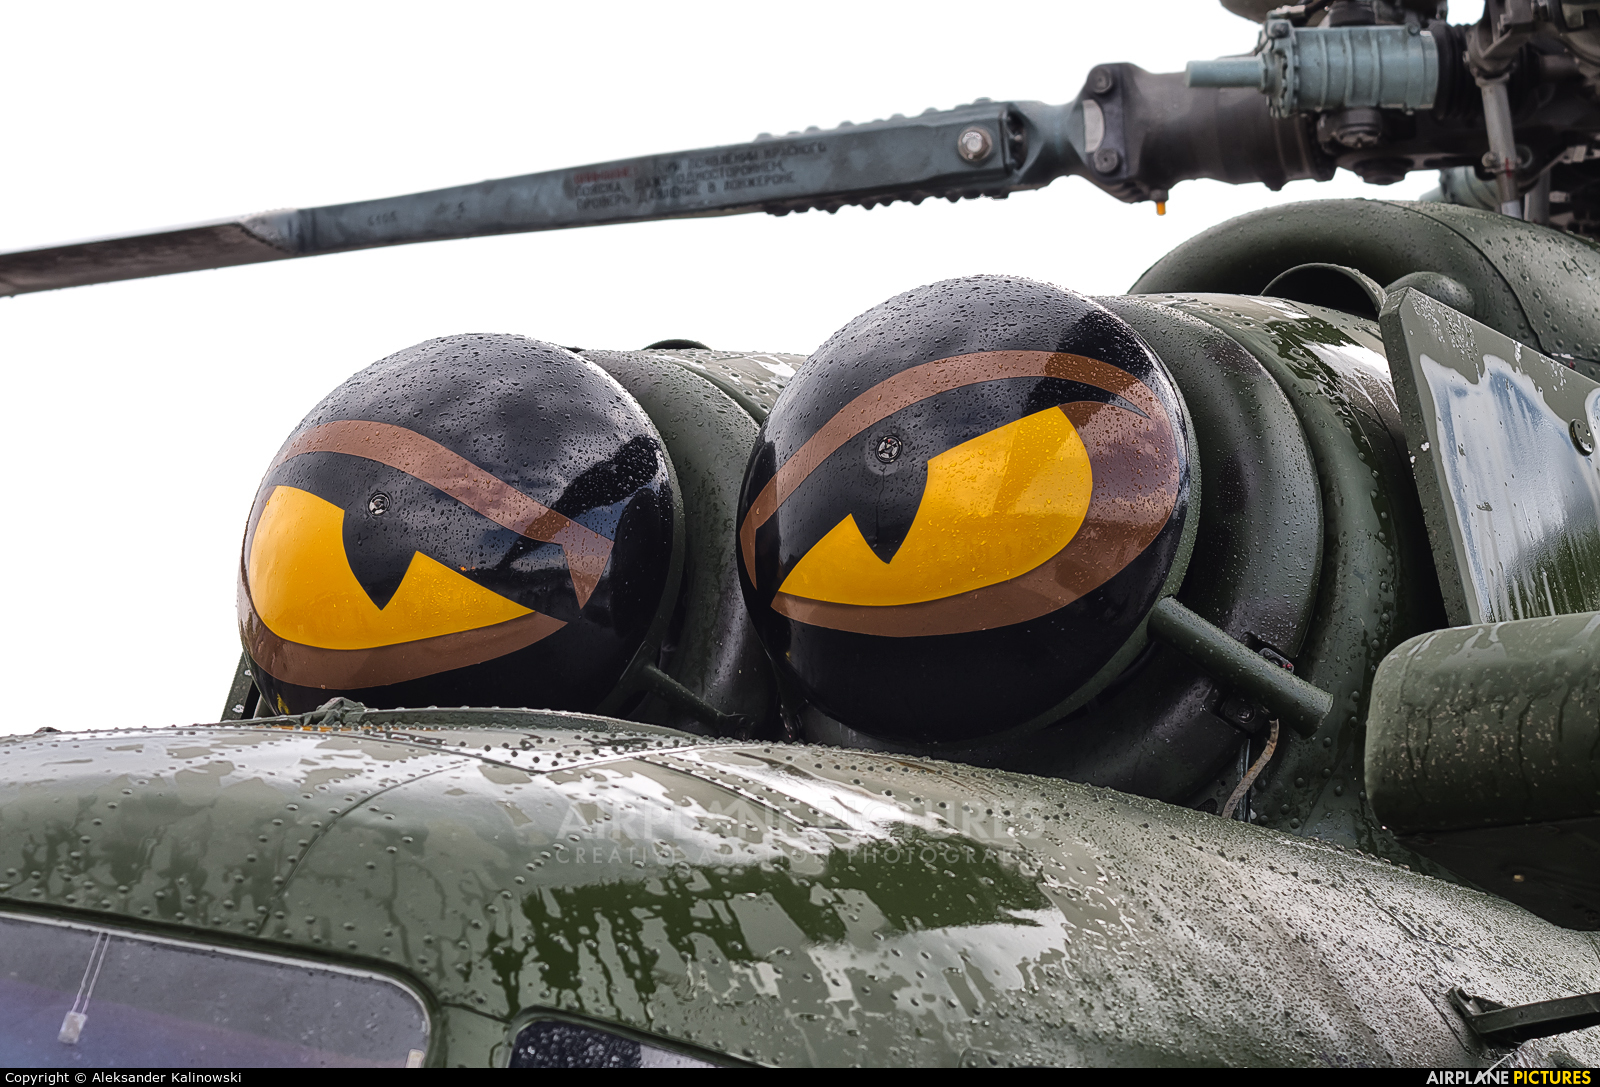 Poland - Army 6105 aircraft at Mińsk Mazowiecki